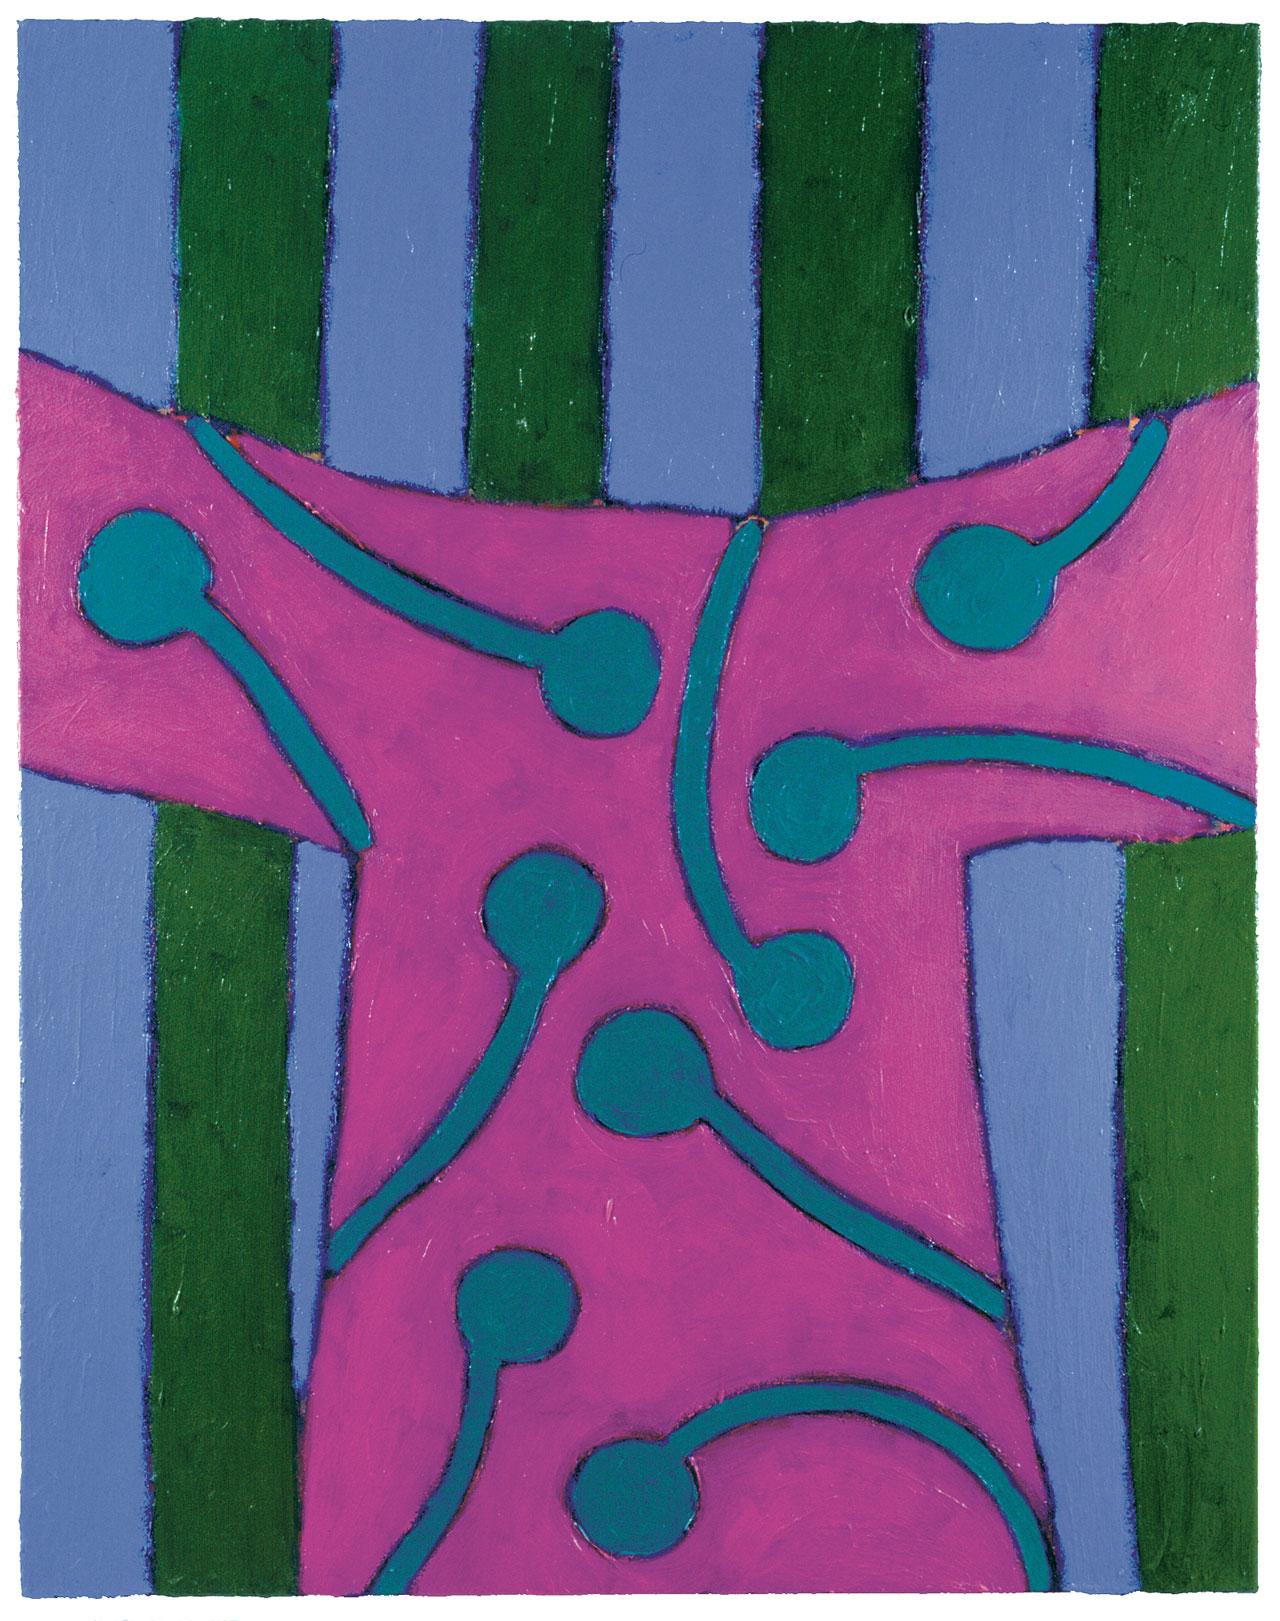 SHINY PATTERNS - GARDEN PIECES IX | 2000 © Kerstin Jeckel